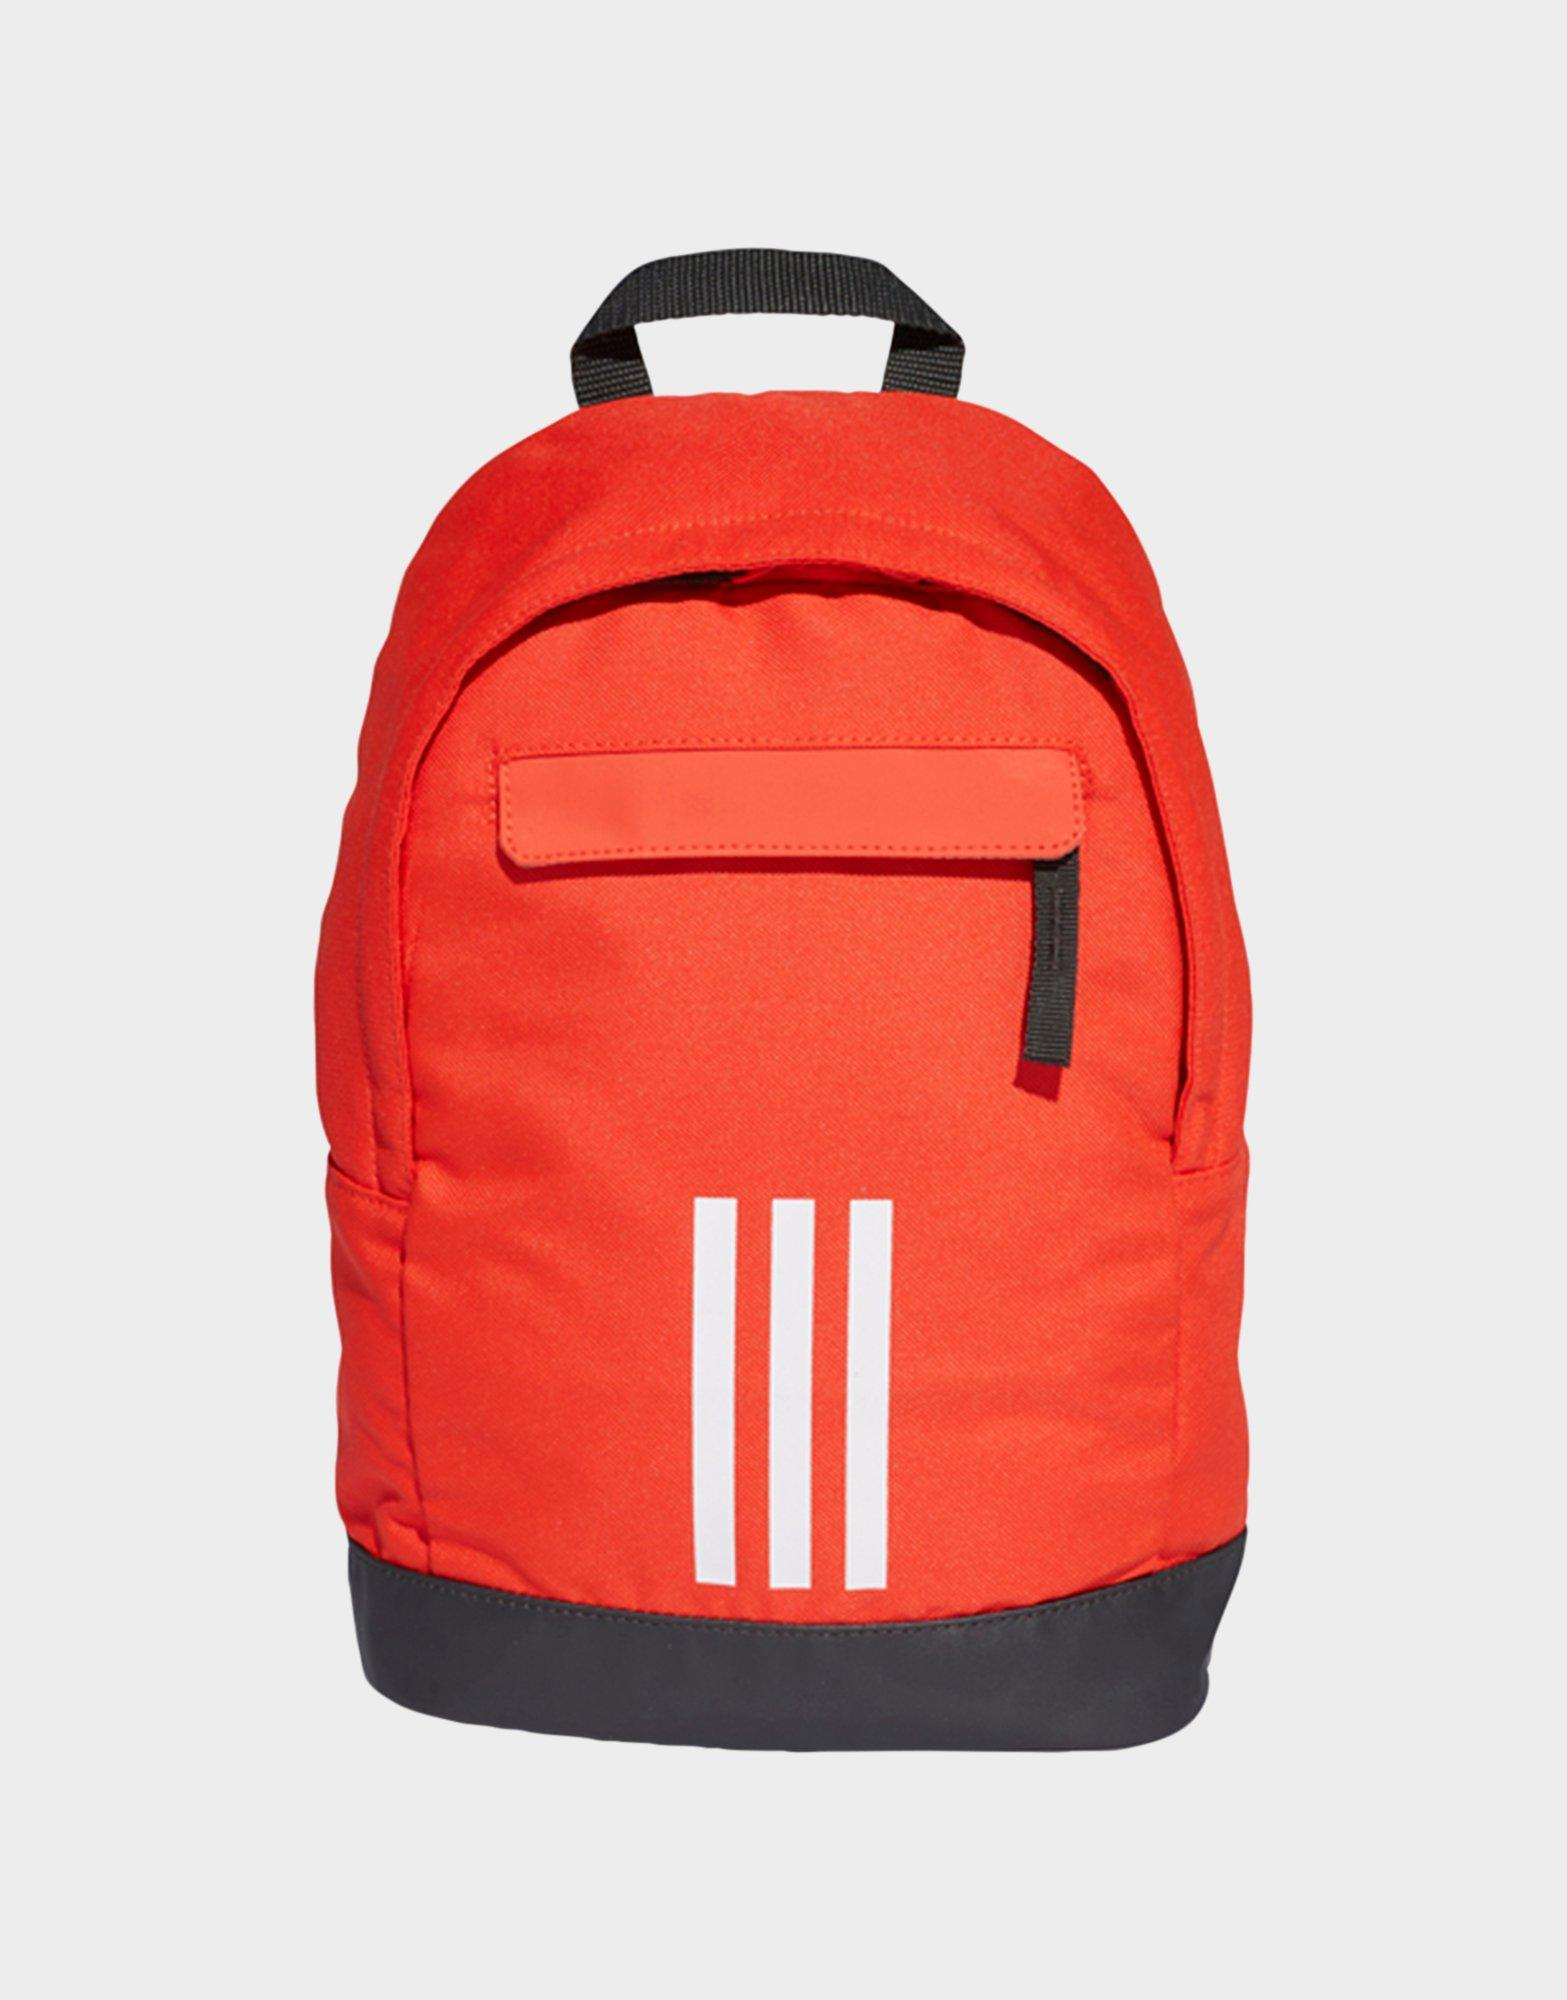 ec3e069eee Adidas Adi Classic 3-stripes Backpack Xs in Red - Lyst